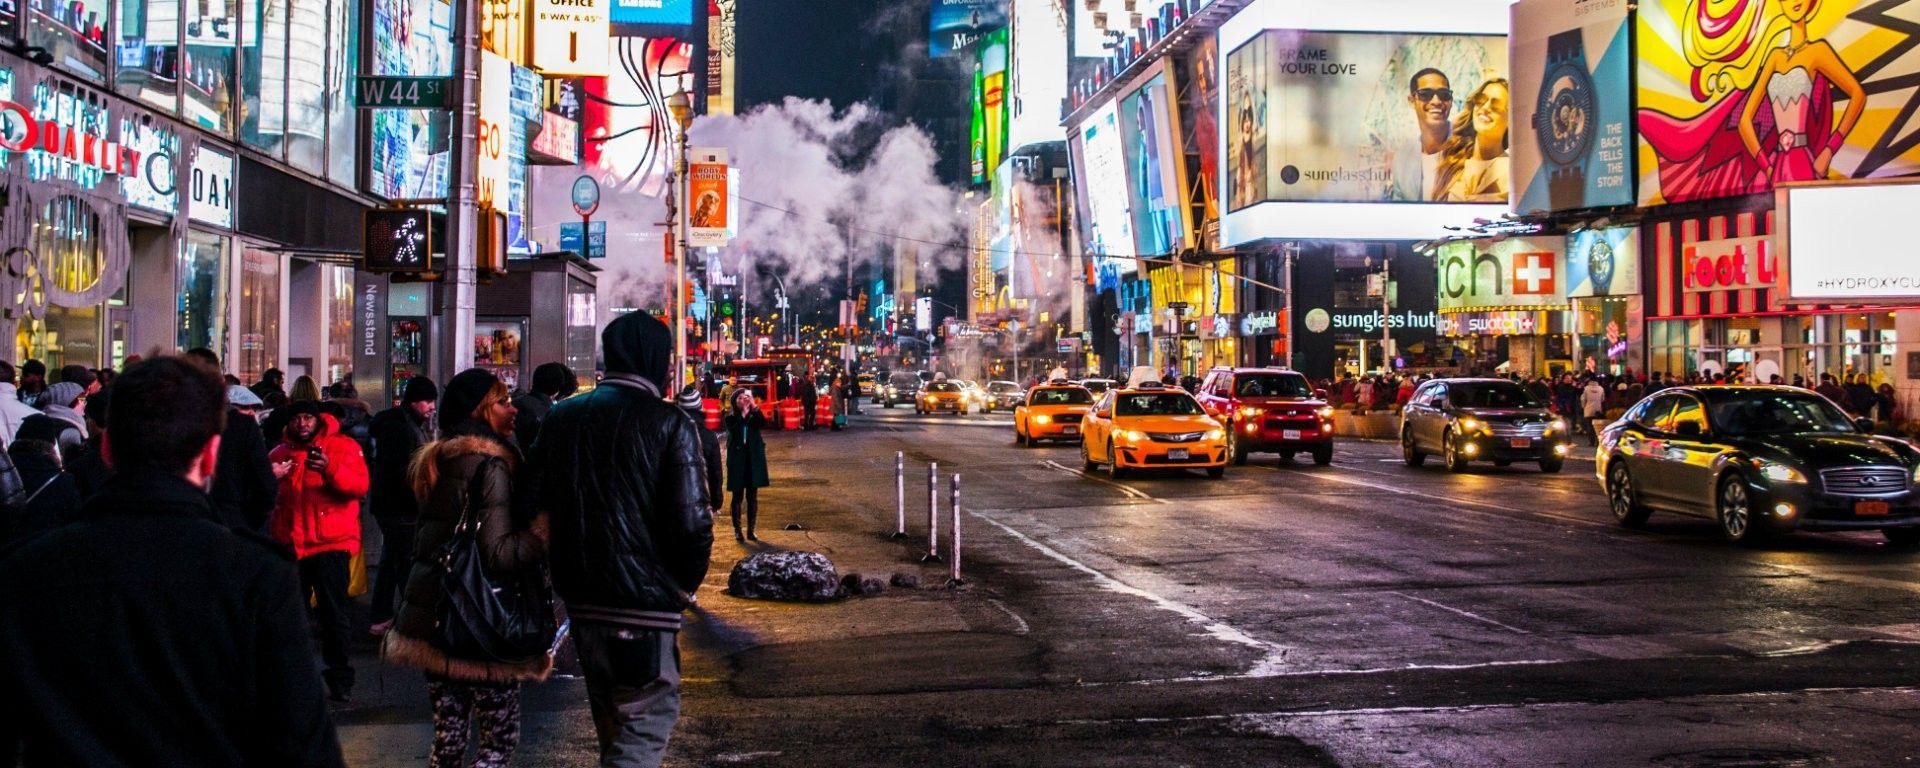 Smart mobility: Uber riduce traffico e inquinamento? Falso